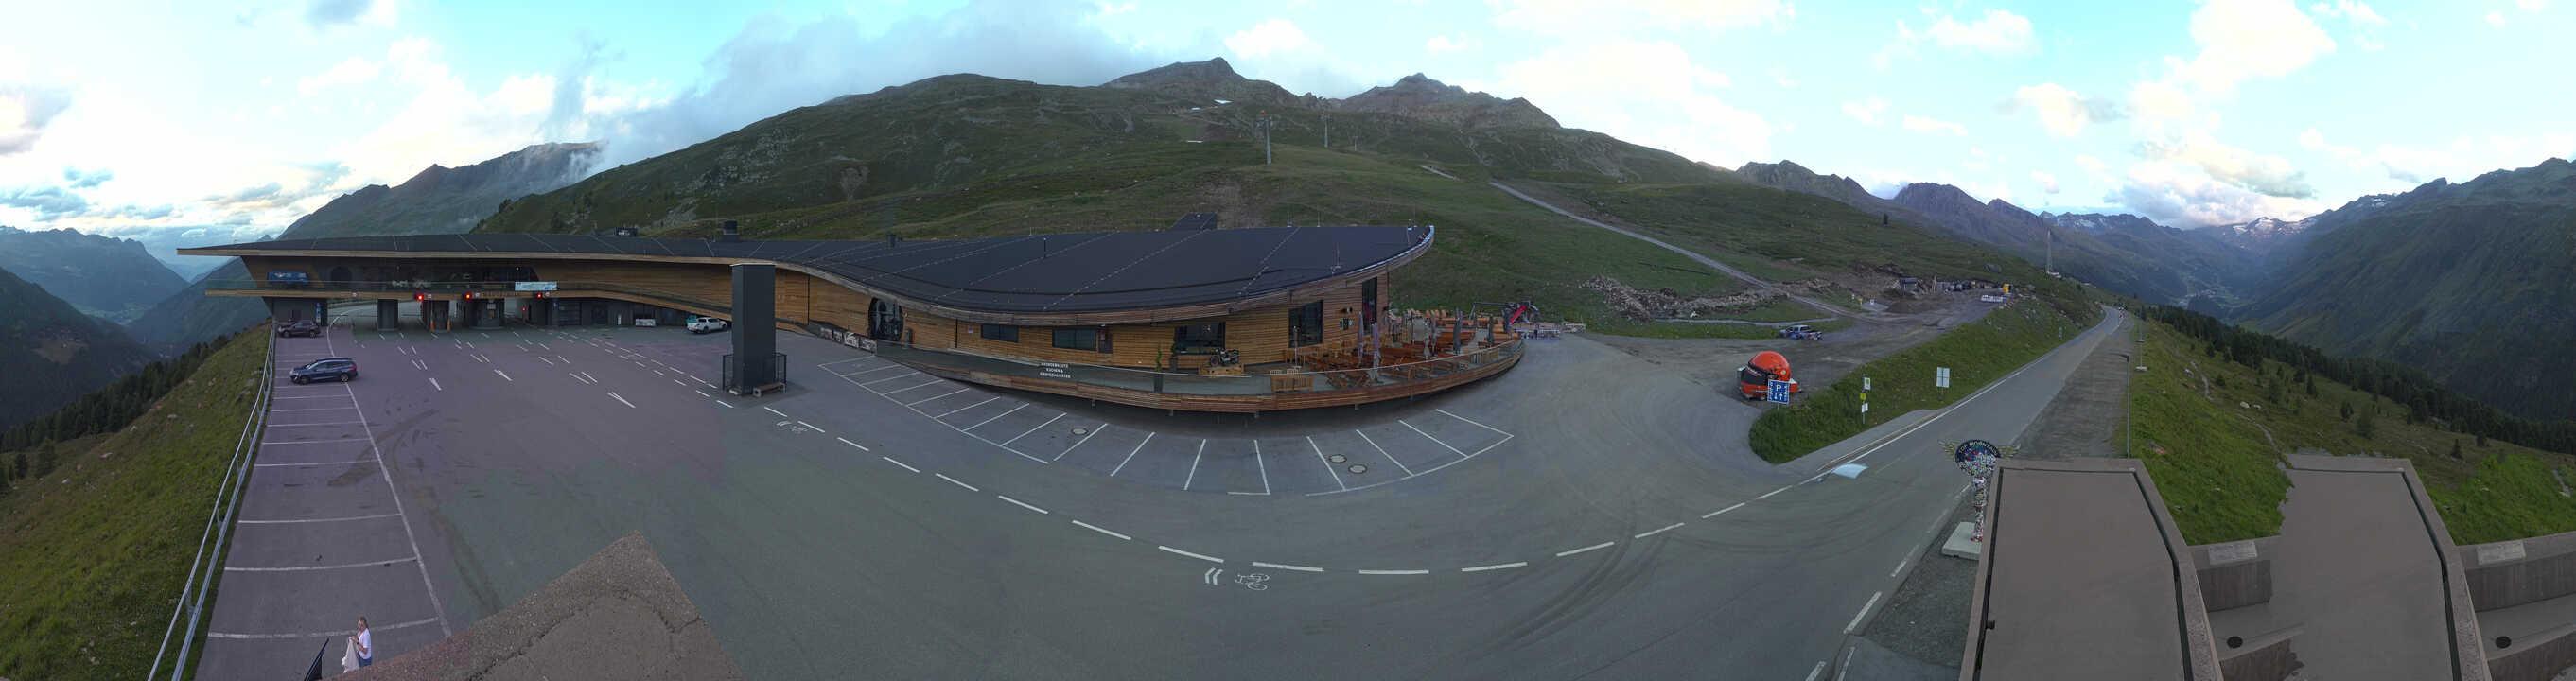 Hochgurgl webcam - Top Mountain Crosspoint